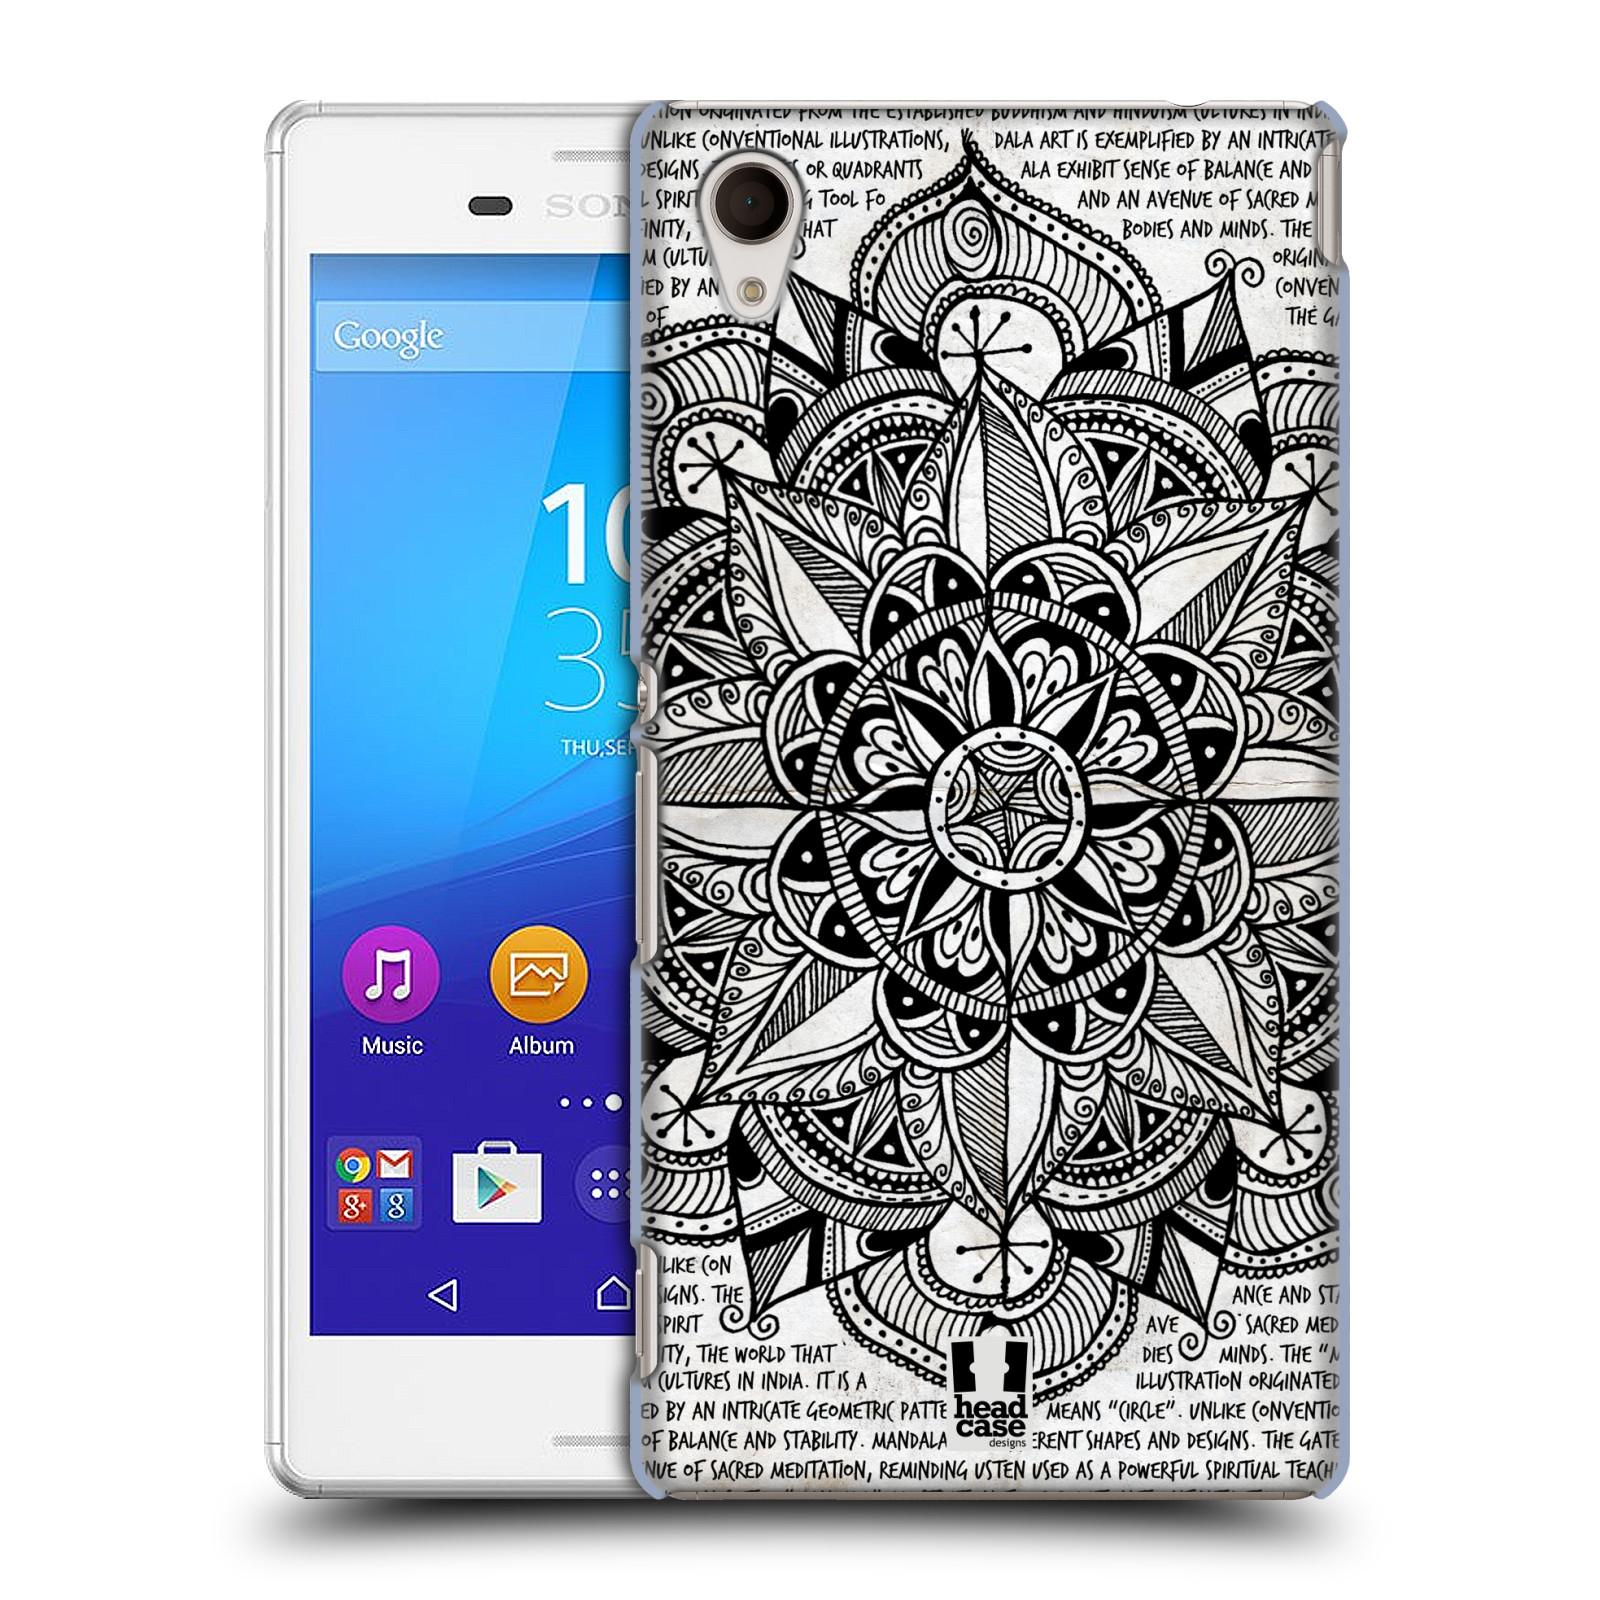 Plastové pouzdro na mobil Sony Xperia M4 Aqua E2303 HEAD CASE Mandala Doodle Paper (Kryt či obal na mobilní telefon Sony Xperia M4 Aqua a M4 Aqua Dual SIM)